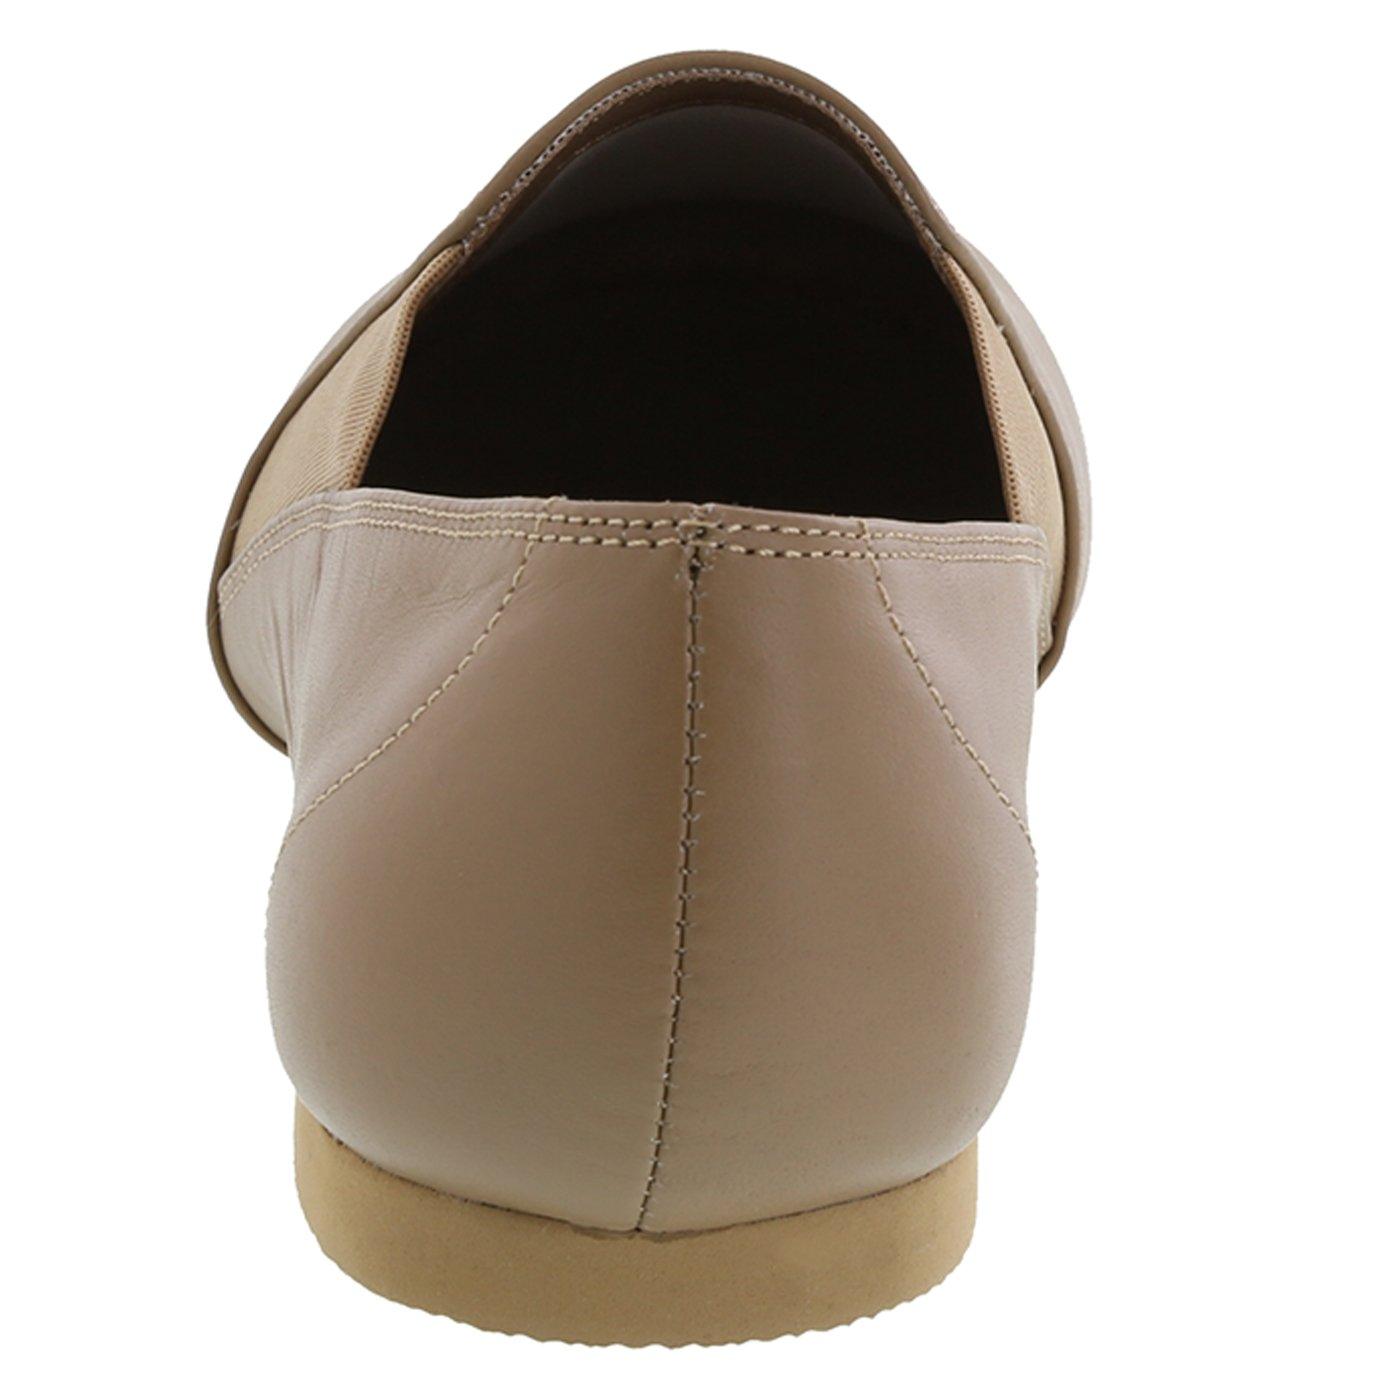 American Ballet Theatre for Spotlights Girls Tan Girls Twin Gore Jazz Shoe 1.5 Regular